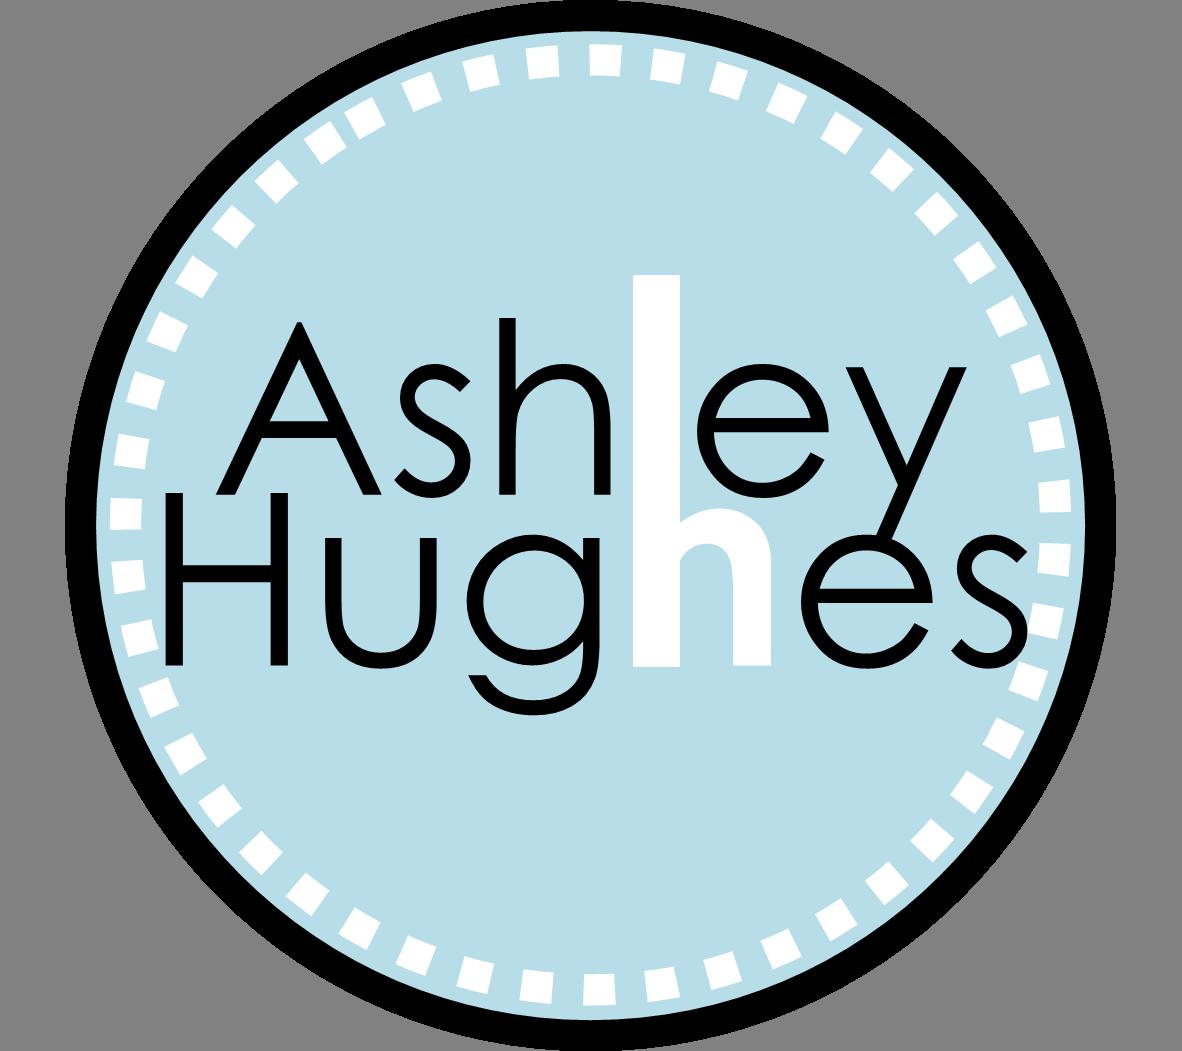 Ashley hughes clipart